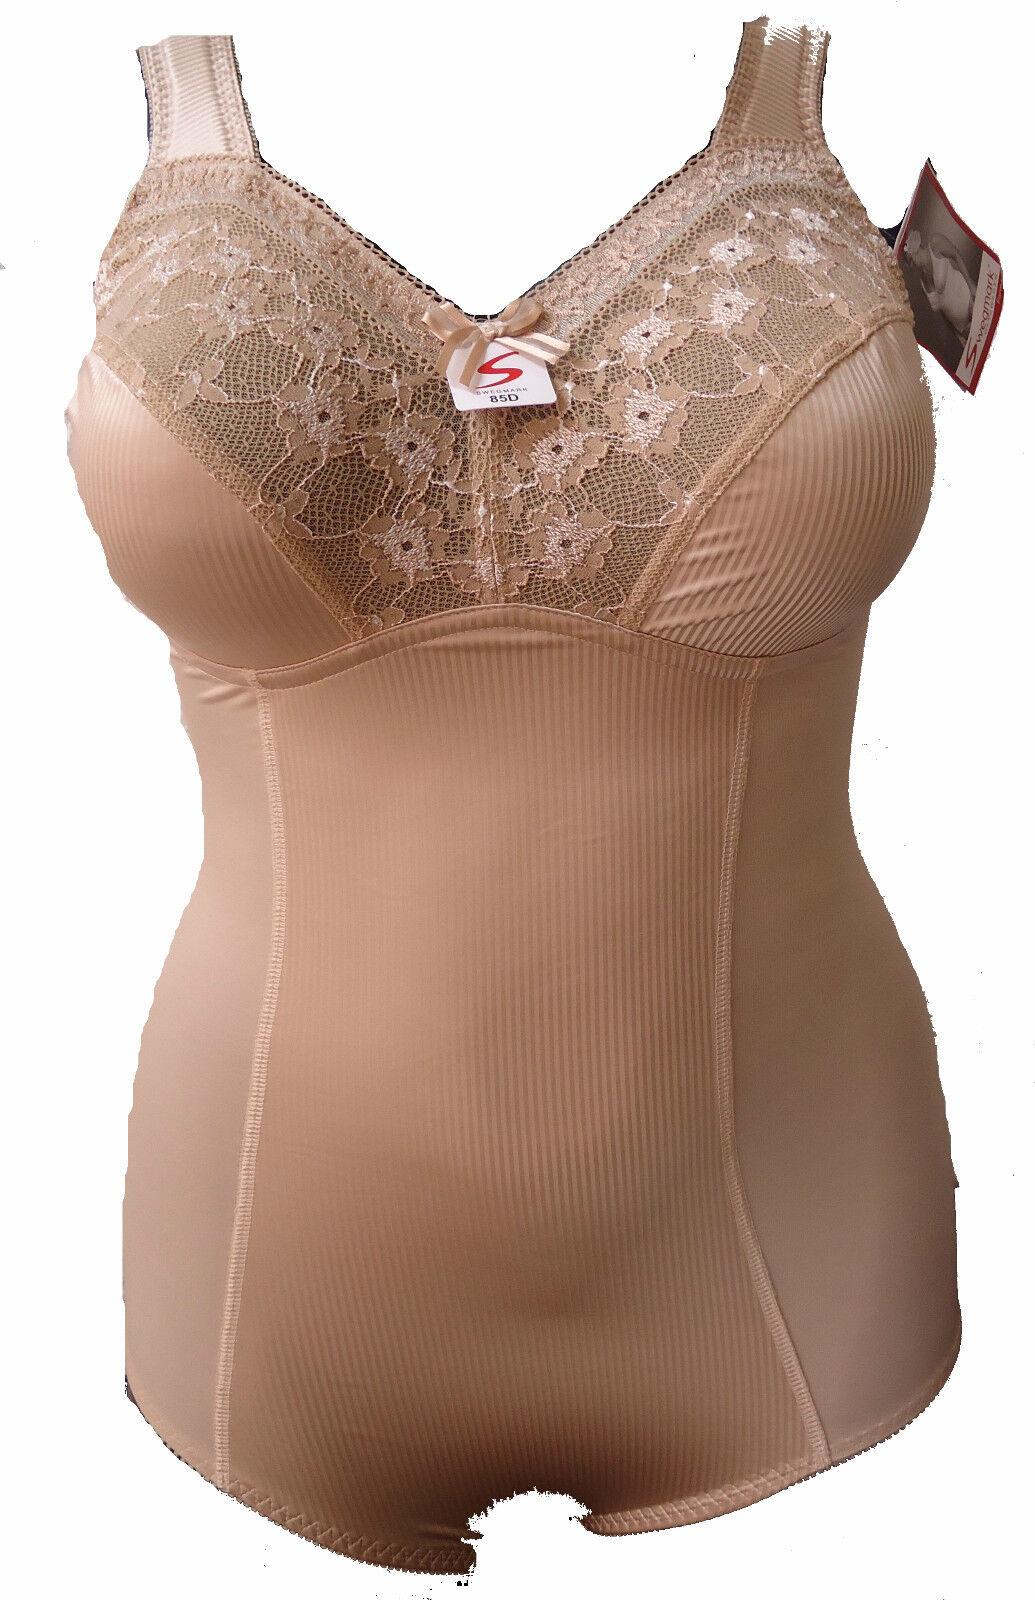 SWEGMARK 37470 FORMA 80-105 D & DD E UK36-46 gold GLANZ Body Einteiler Shapewear